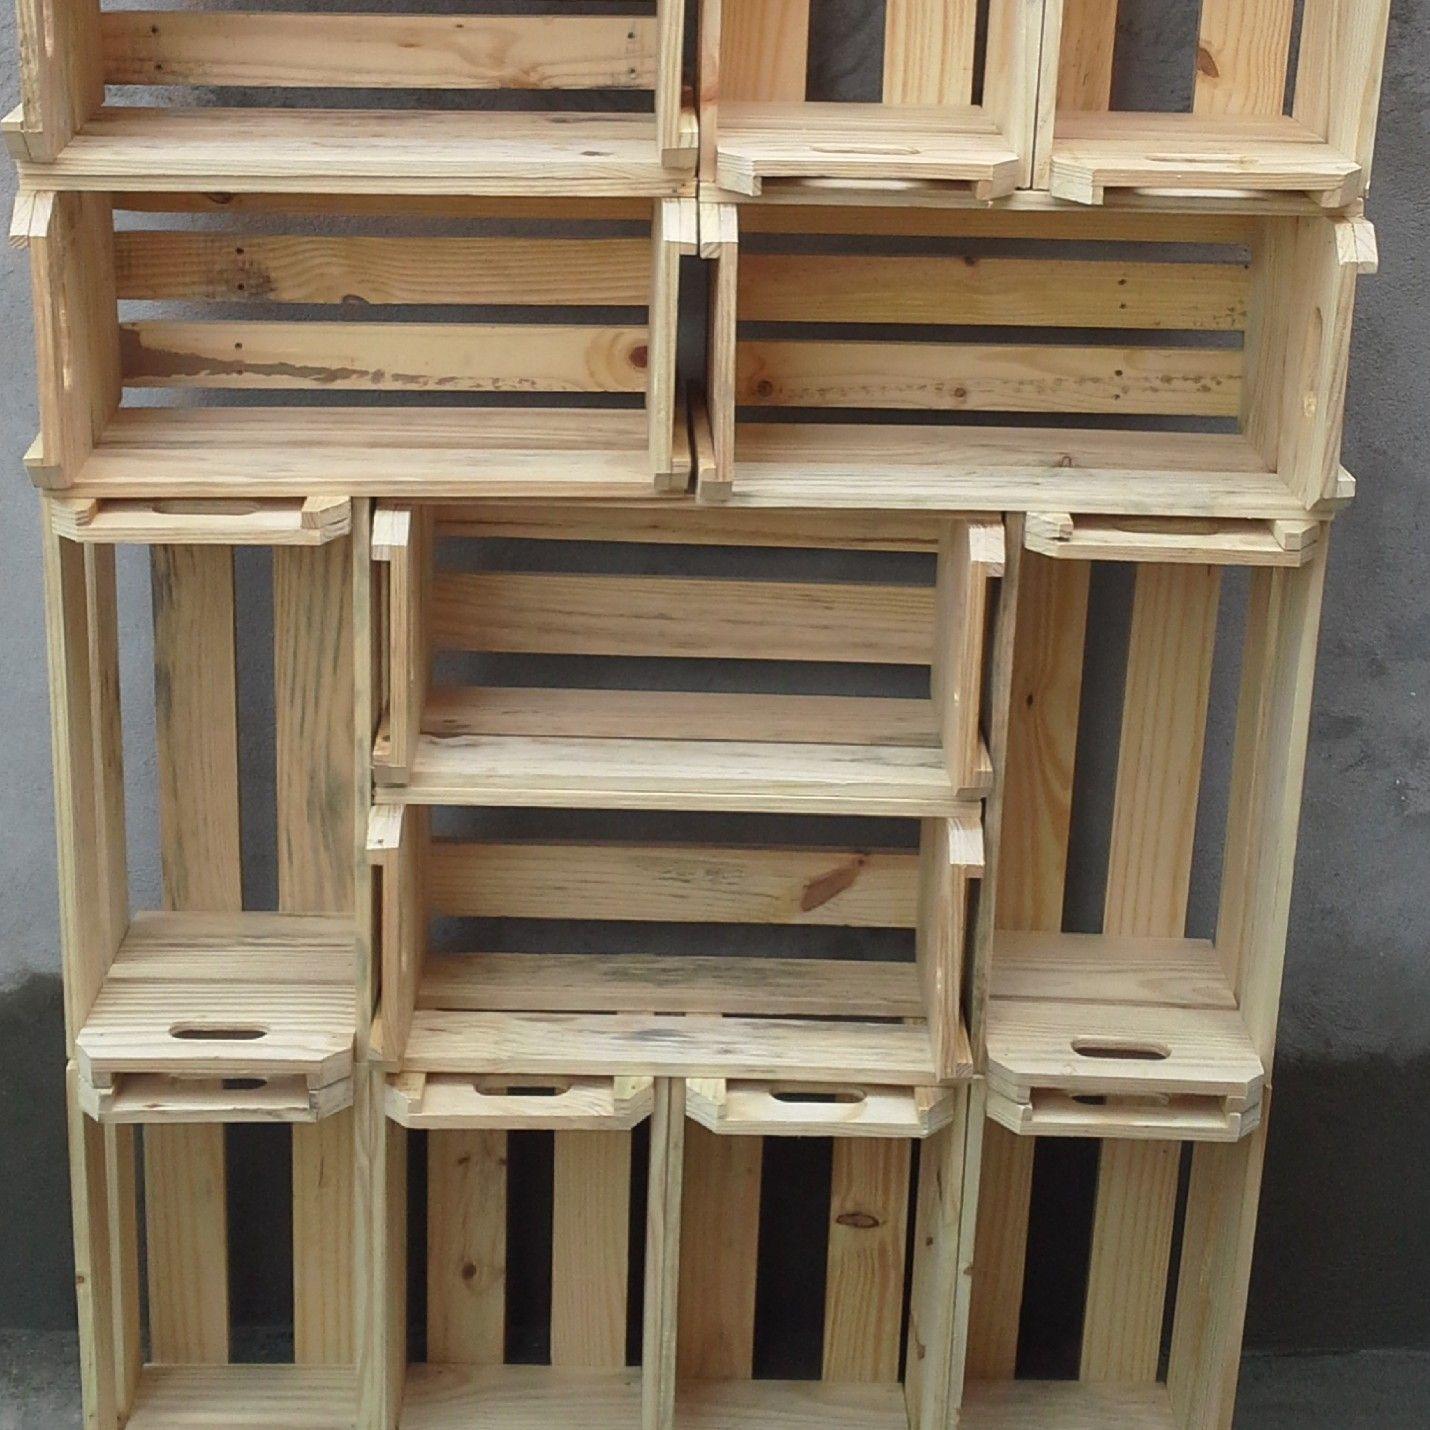 Armario Lavanderia Leroy Merlin ~ armário de caixotes armário ou estante de caixotes Pinterest Armario de caixote, Esta